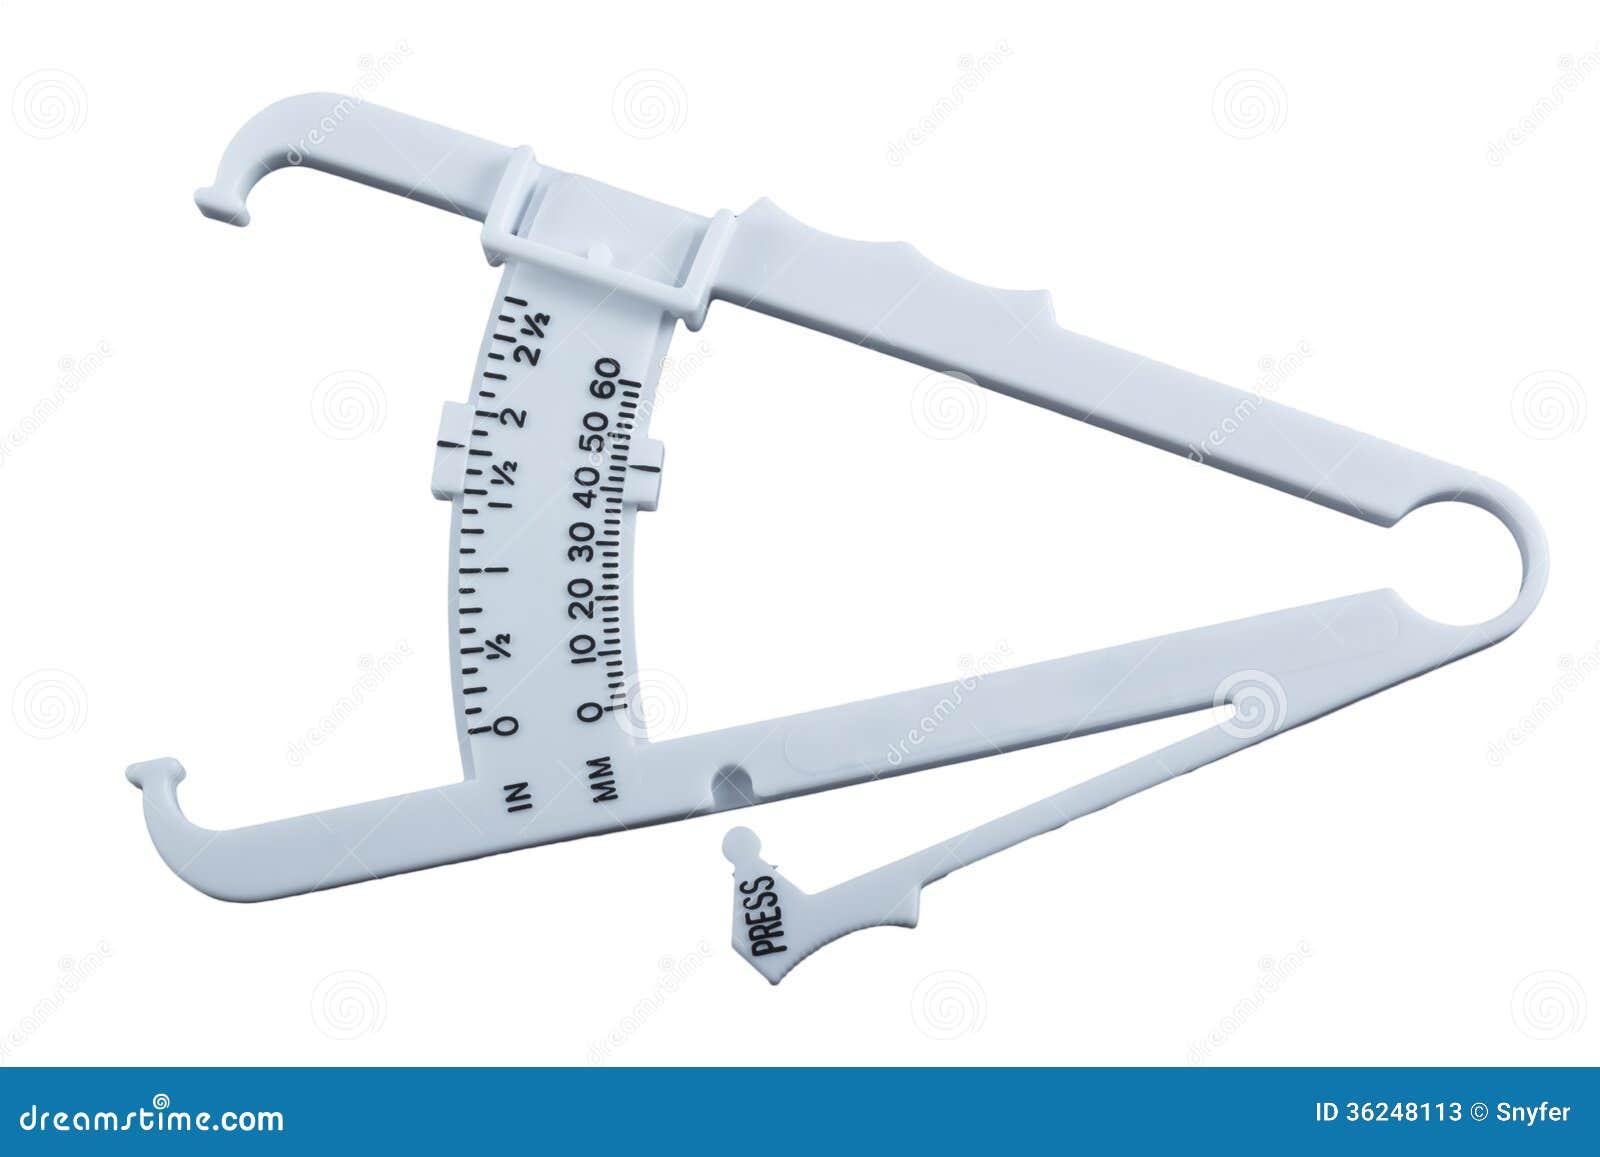 Body Fat Measuring Calipers. Stock Photos - Image: 36248113